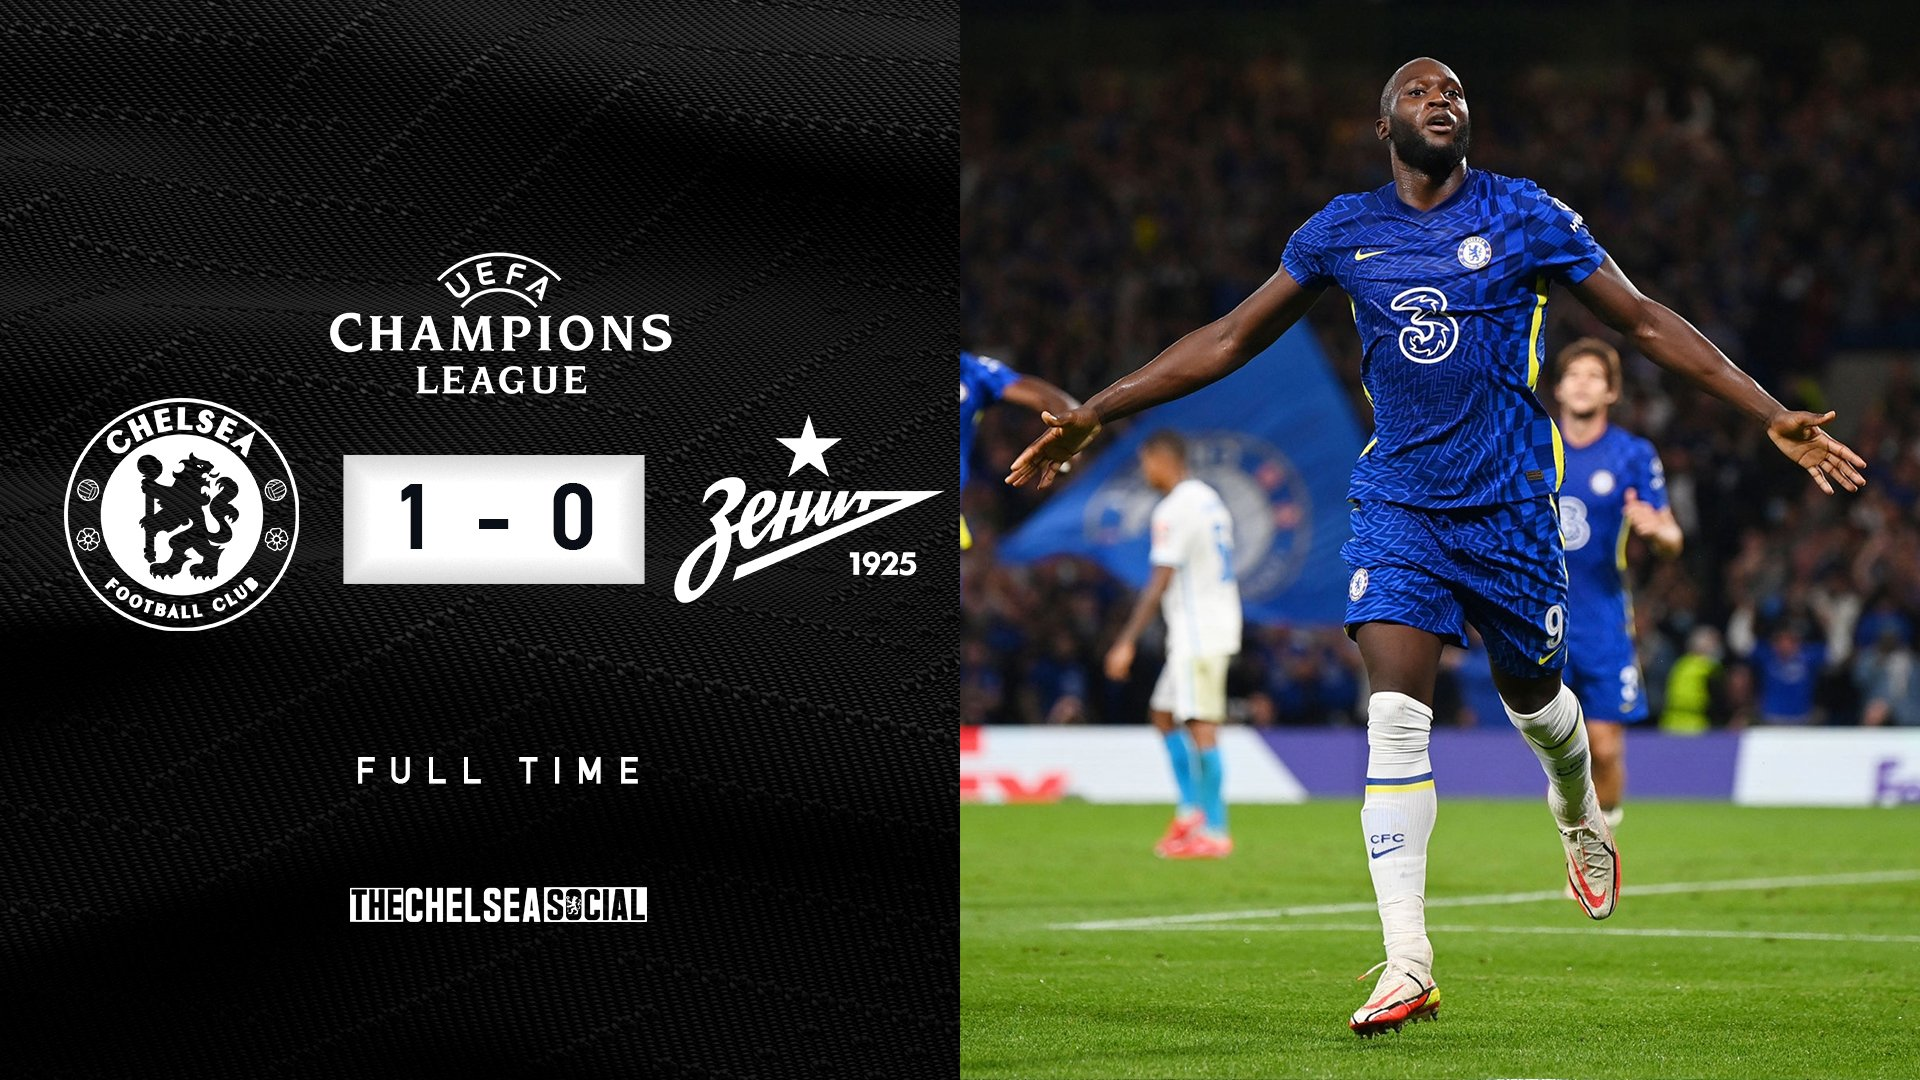 Romelu Lukaku (above) celebrates scoring the winning goal for Chelsea against Zenit. (Edit by @pabloedition)